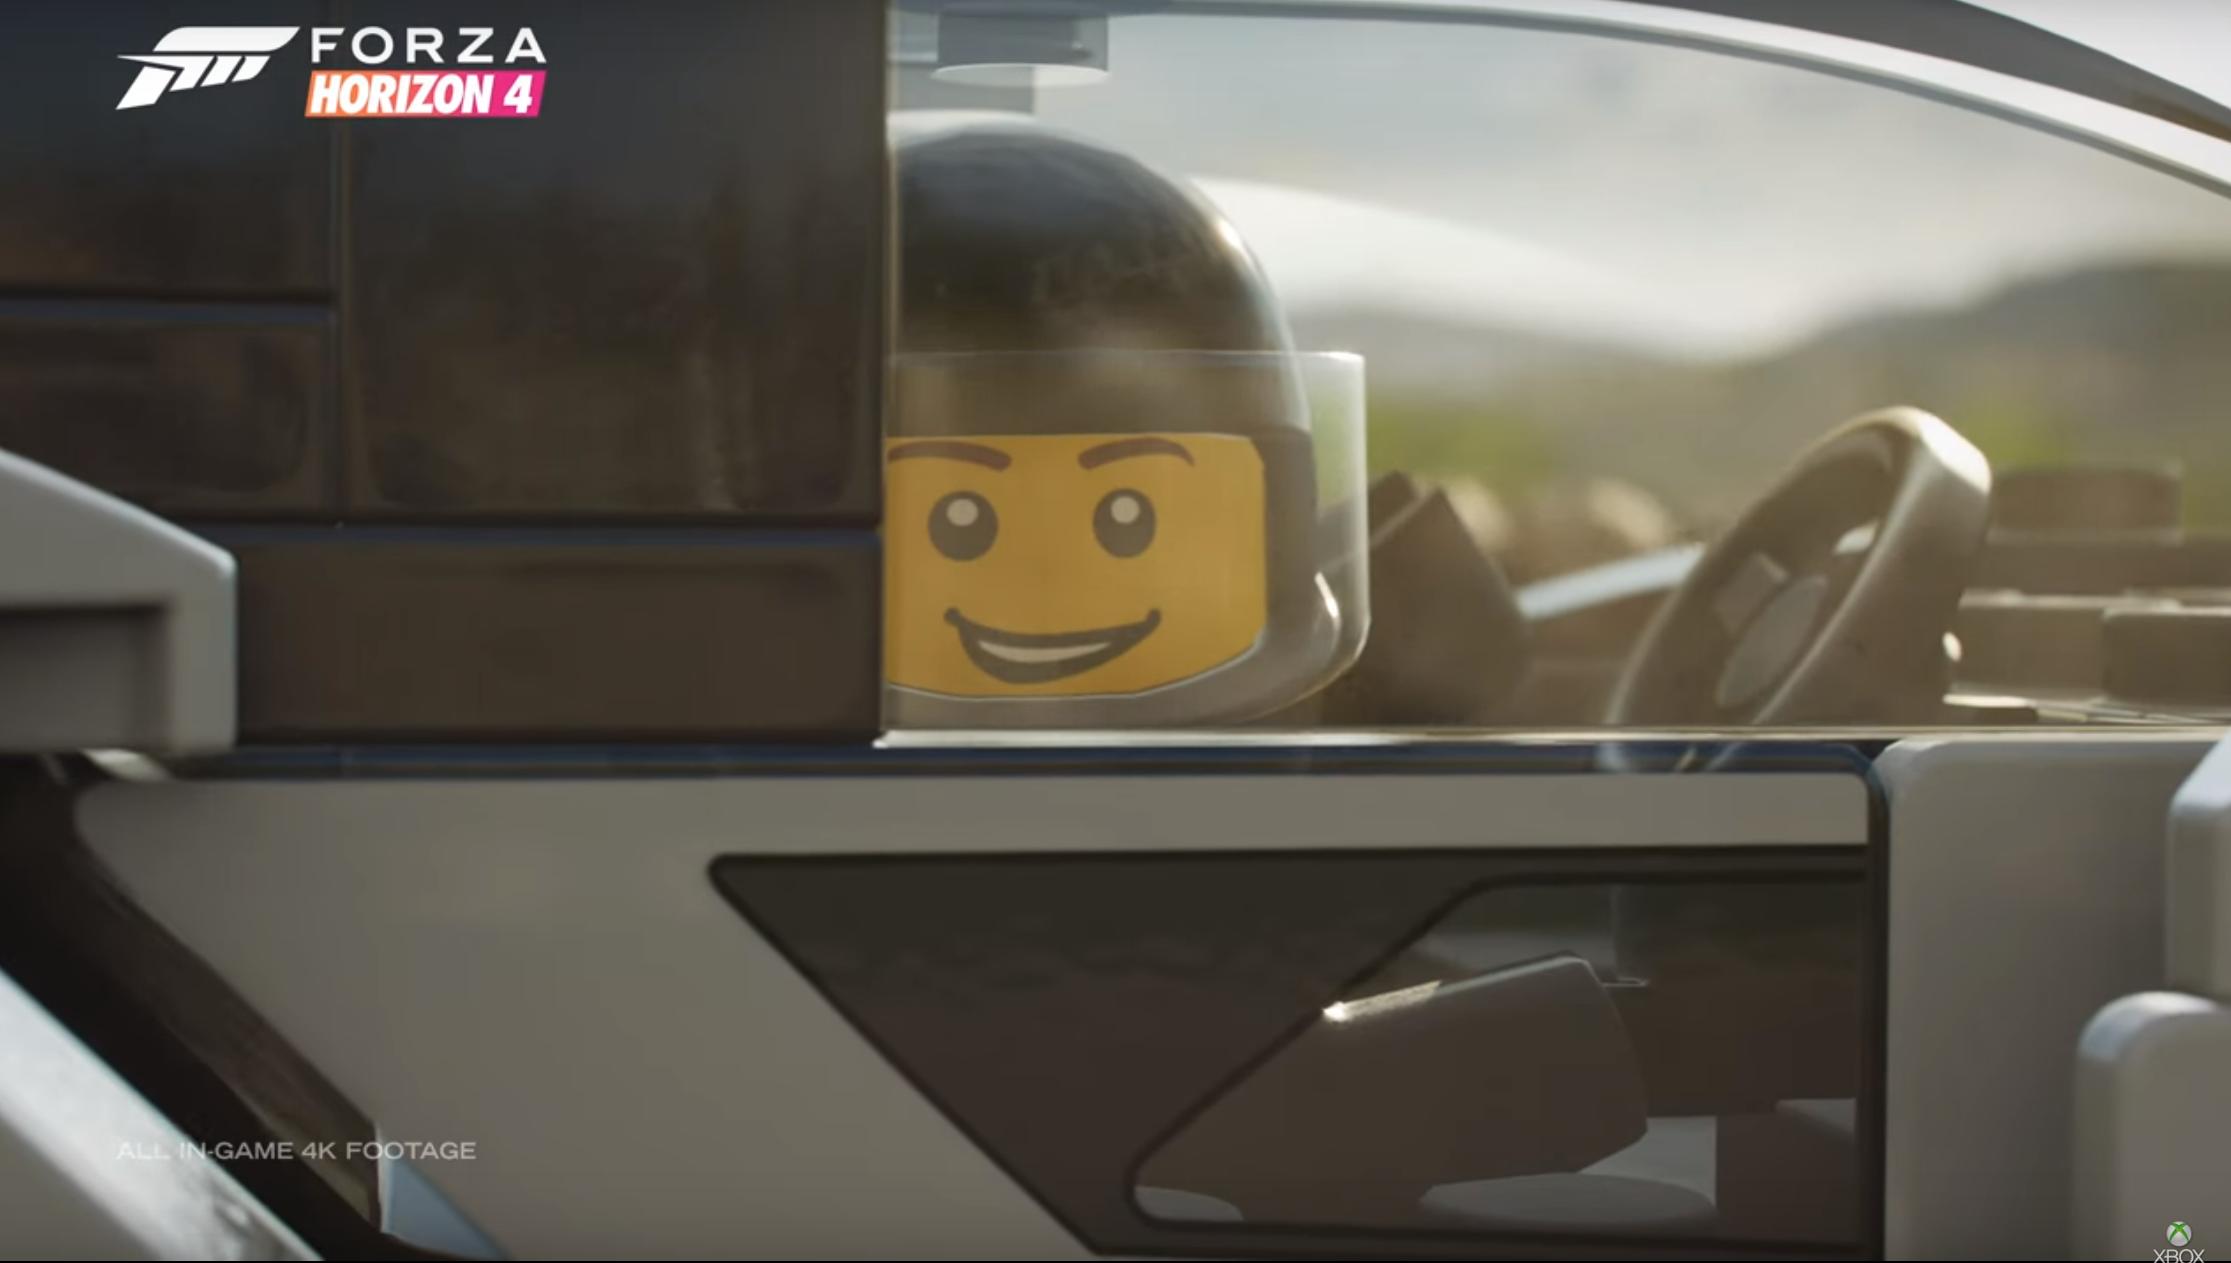 Lego is coming to Forza Horizon to encourage smashing cars